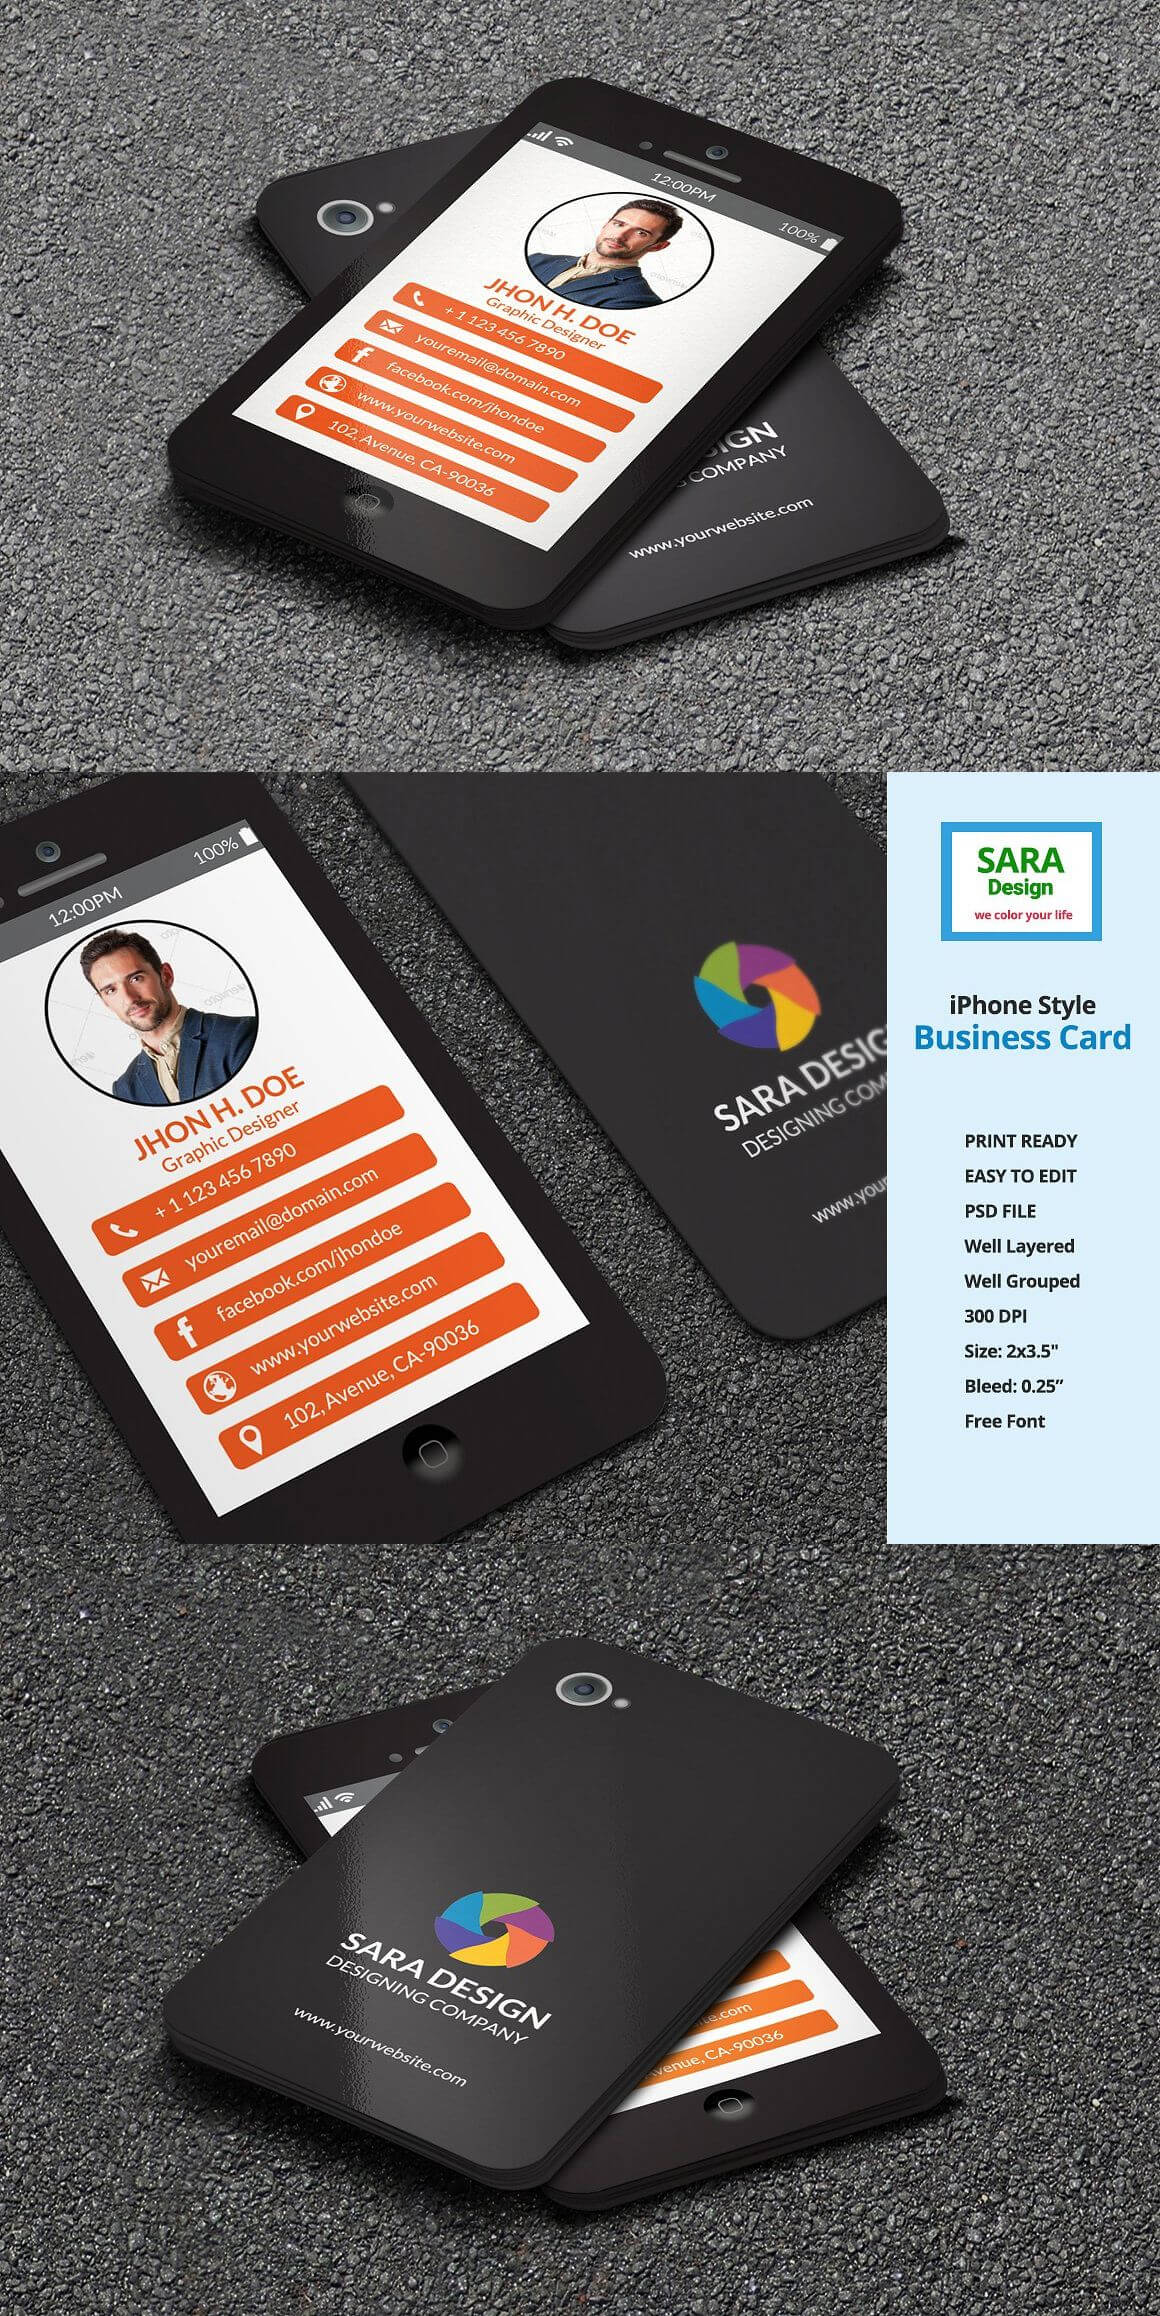 Iphone Stylish Business Card Templates Psd | Business Card with regard to Iphone Business Card Template